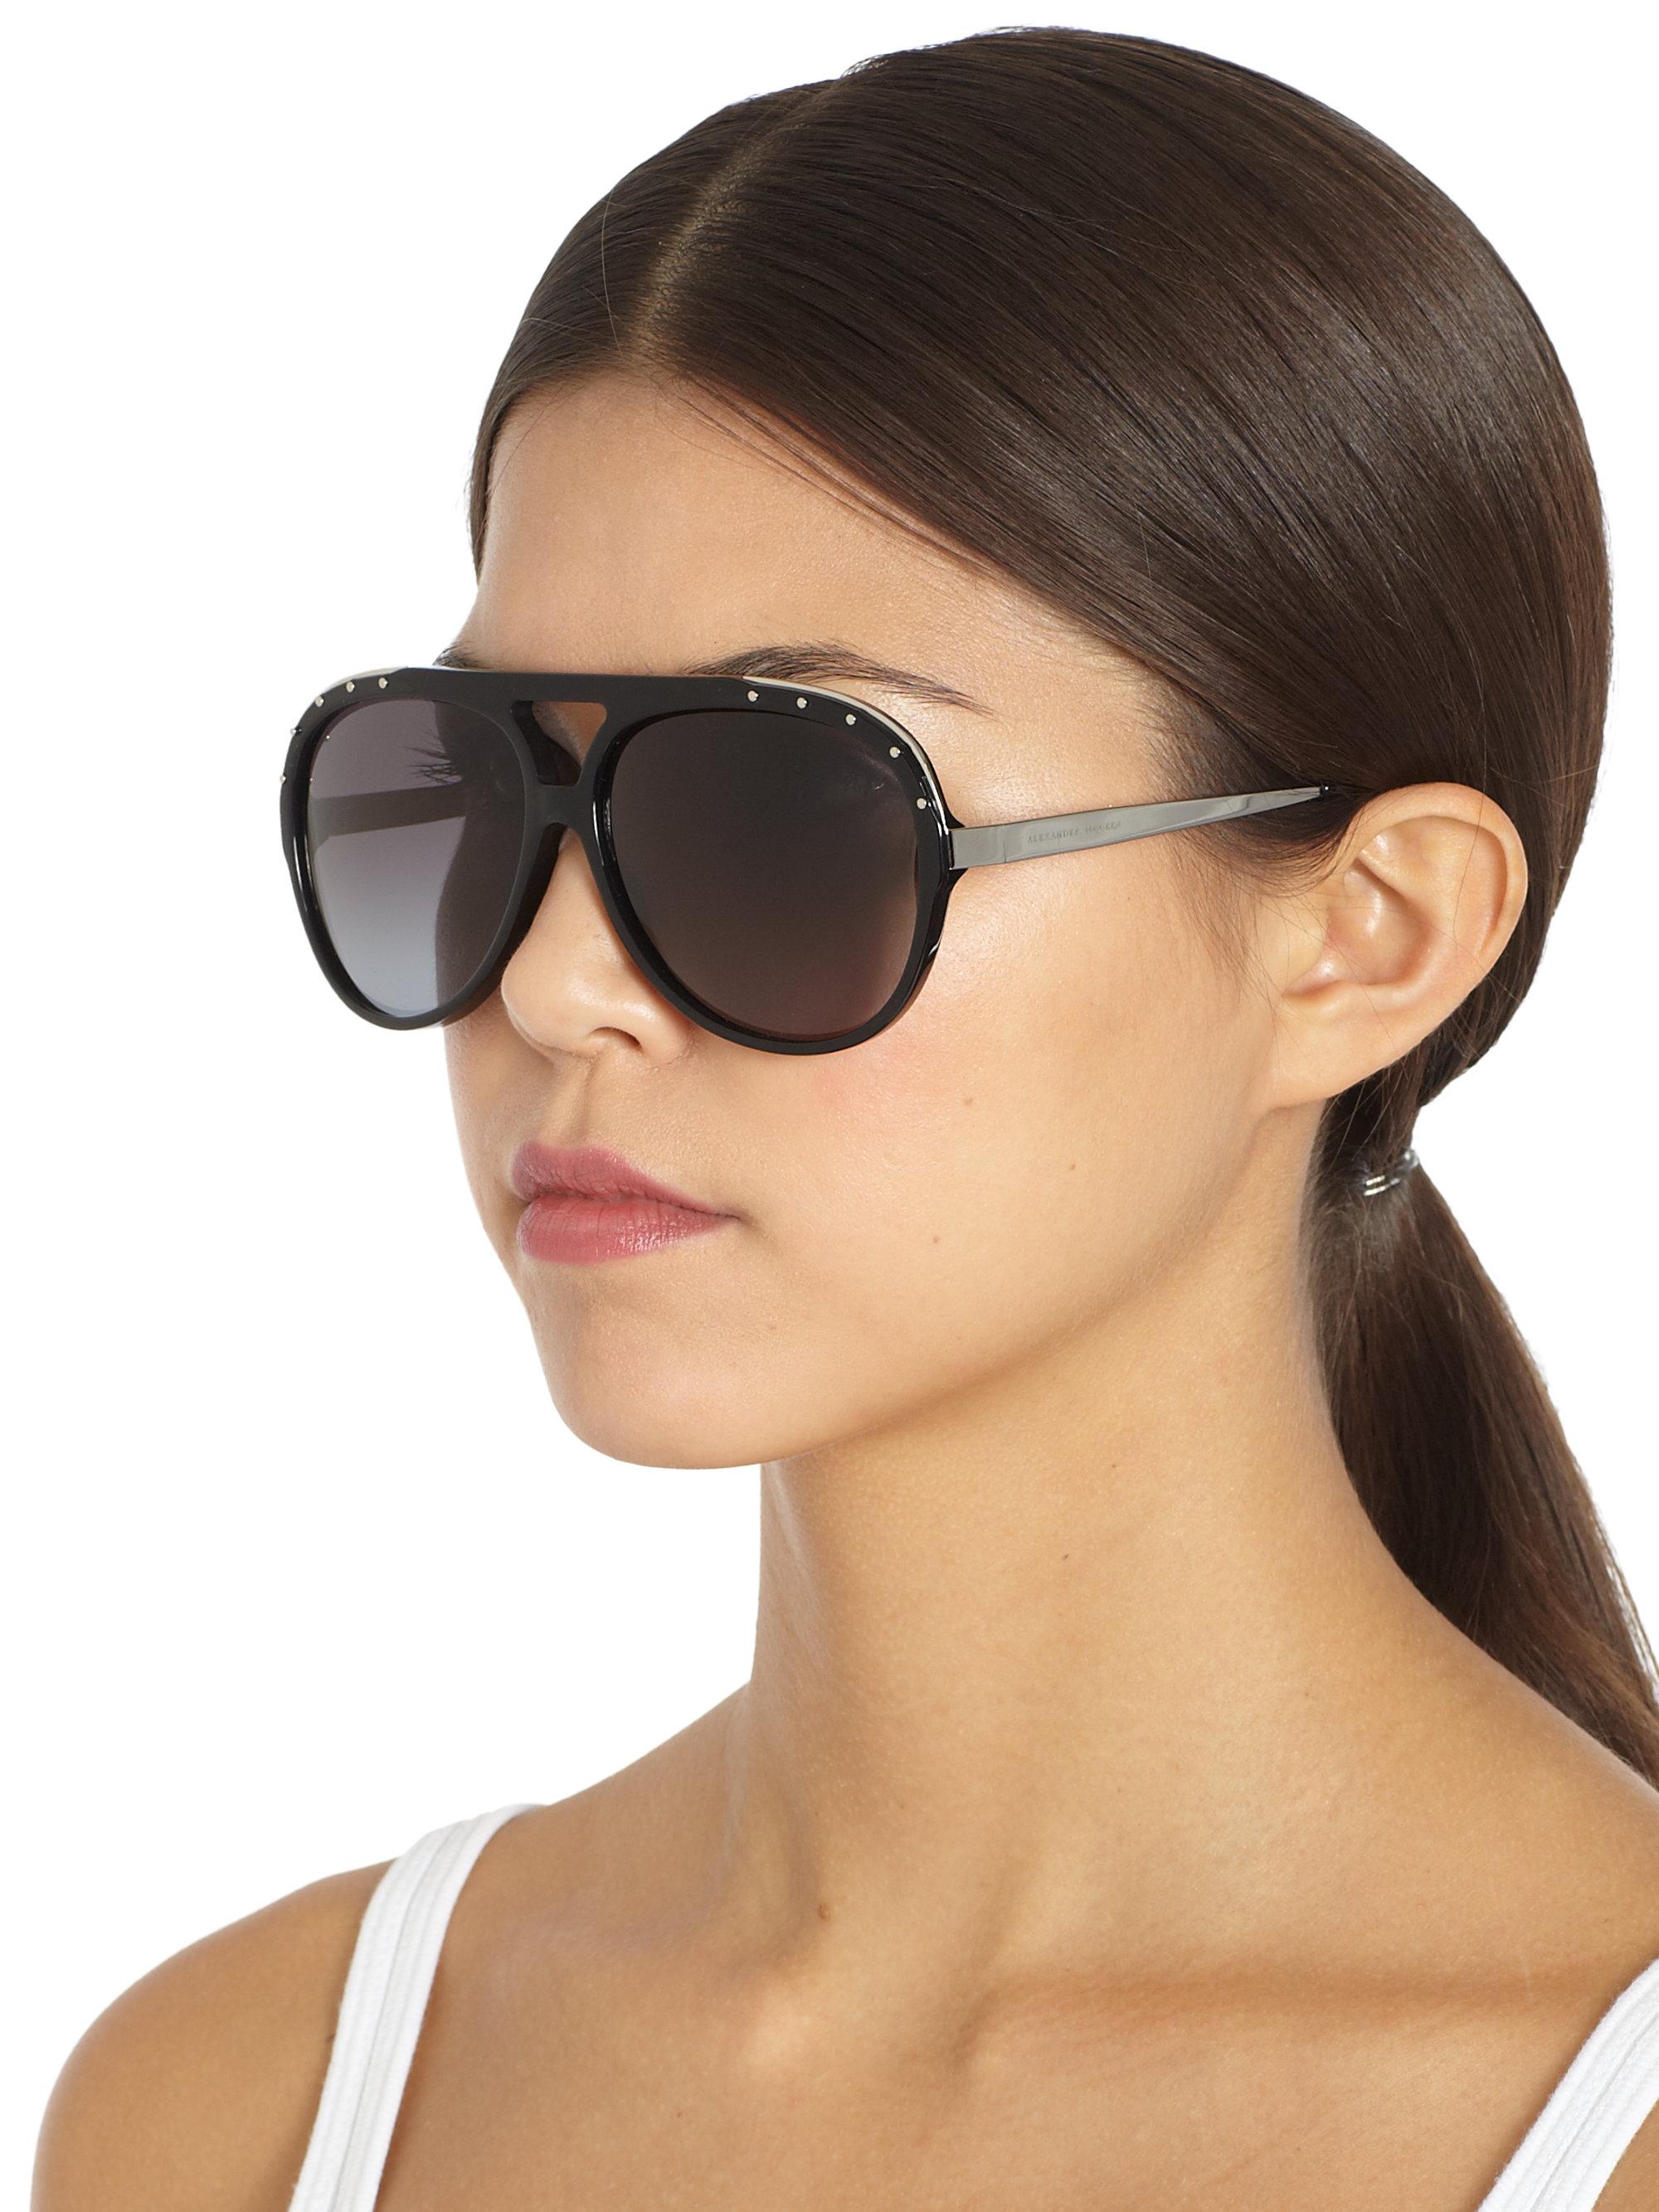 8c5087d61 Alexander McQueen Studded Acetate Aviator Sunglasses in Black - Lyst